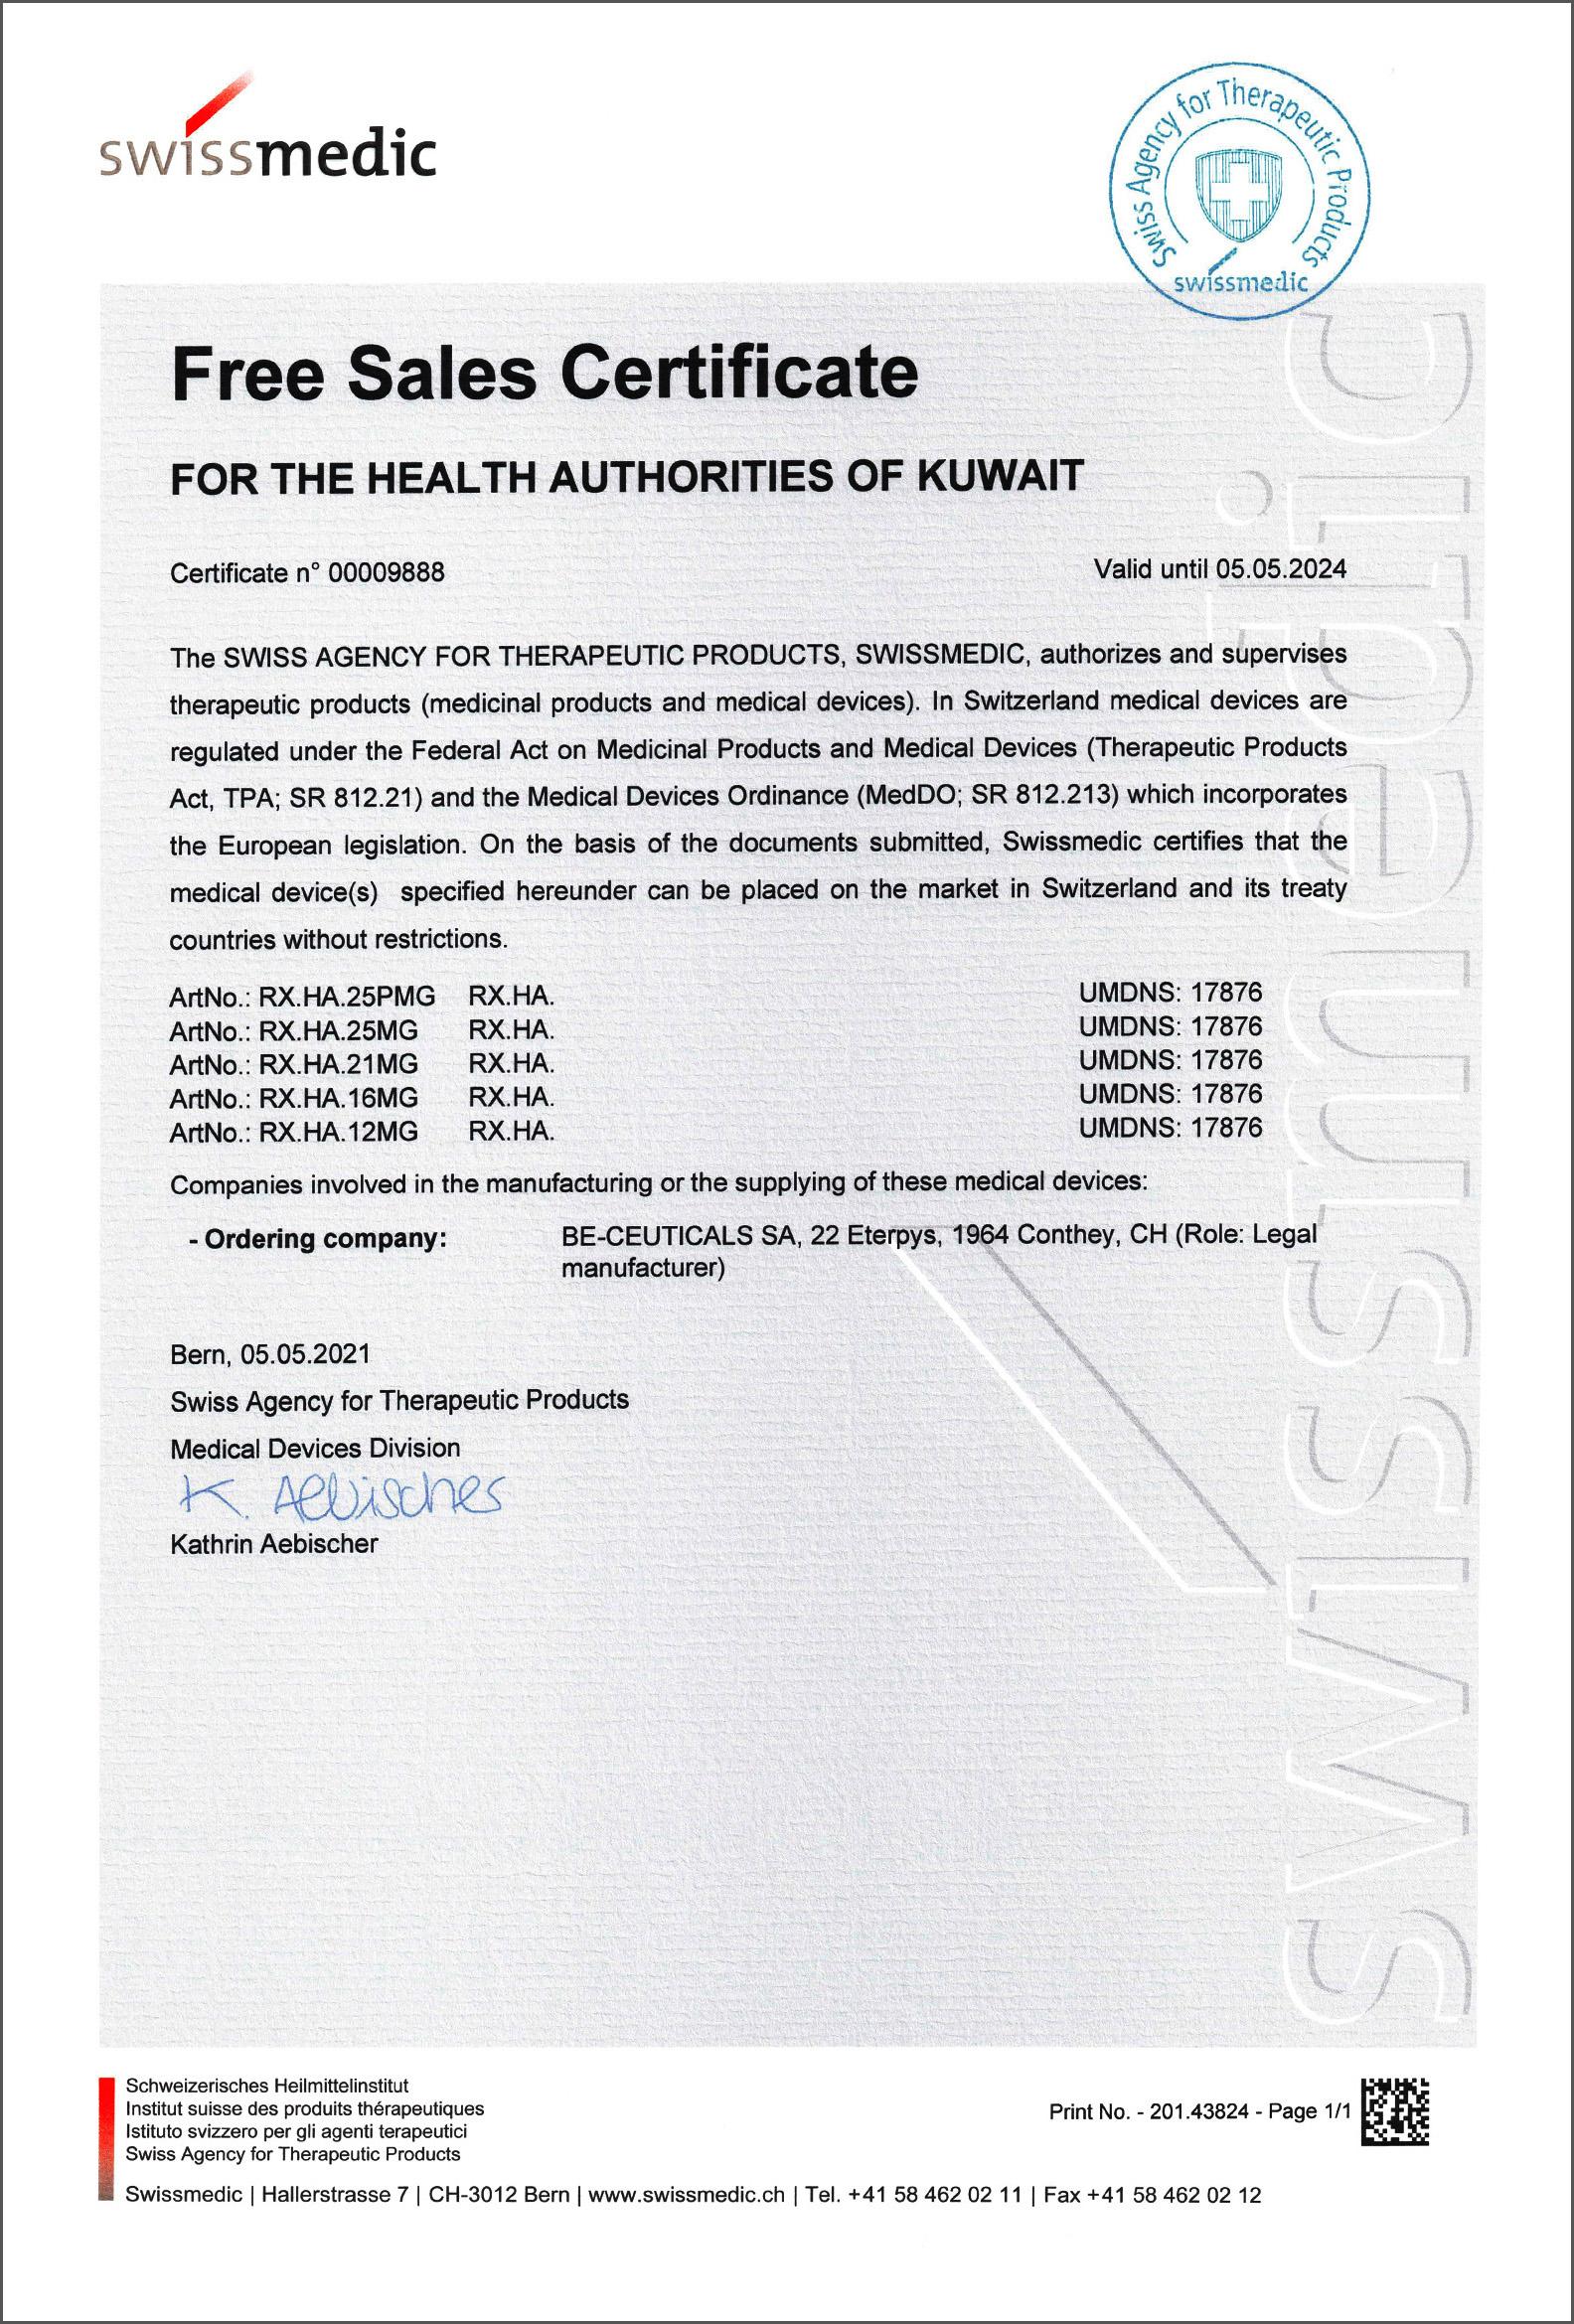 Swissmedic - Free Sales Certificate - Kuwait